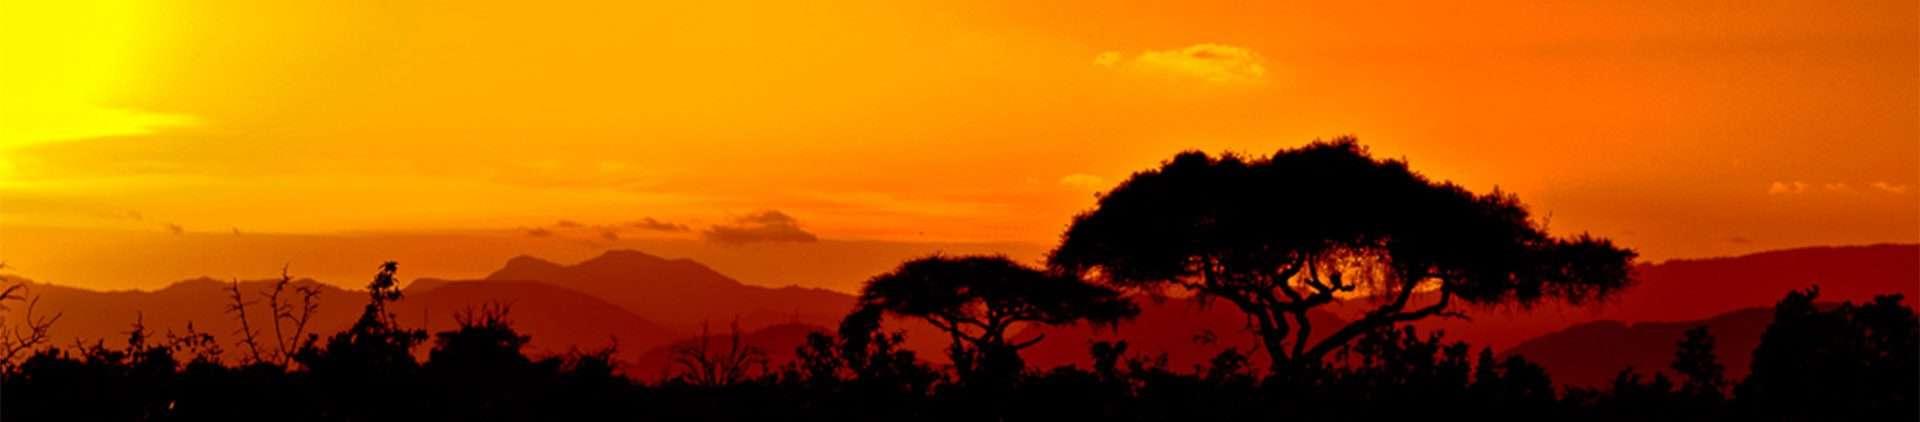 KARIBU IN SENEGAL – Diario di viaggio